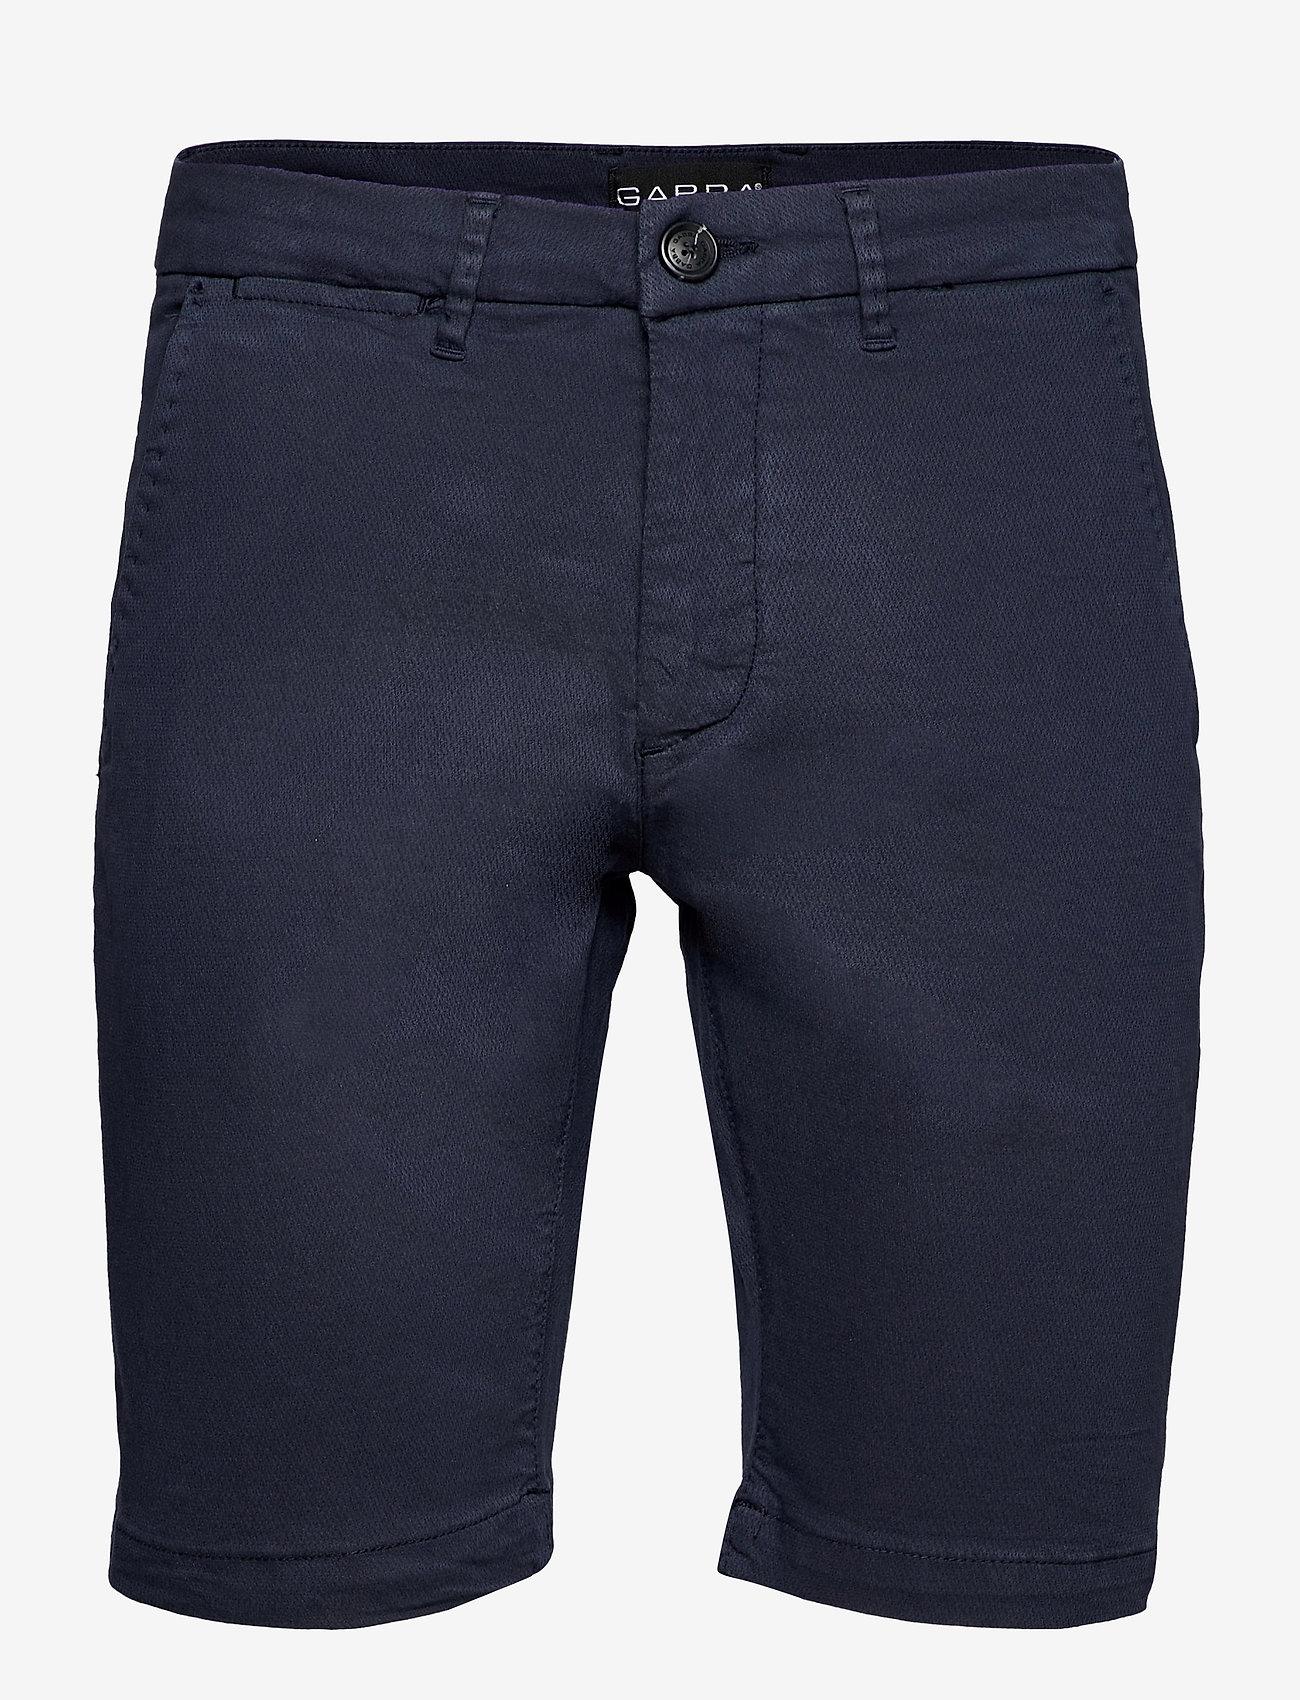 Gabba - Jason K3280 Dale Shorts - chinos shorts - navy - 0